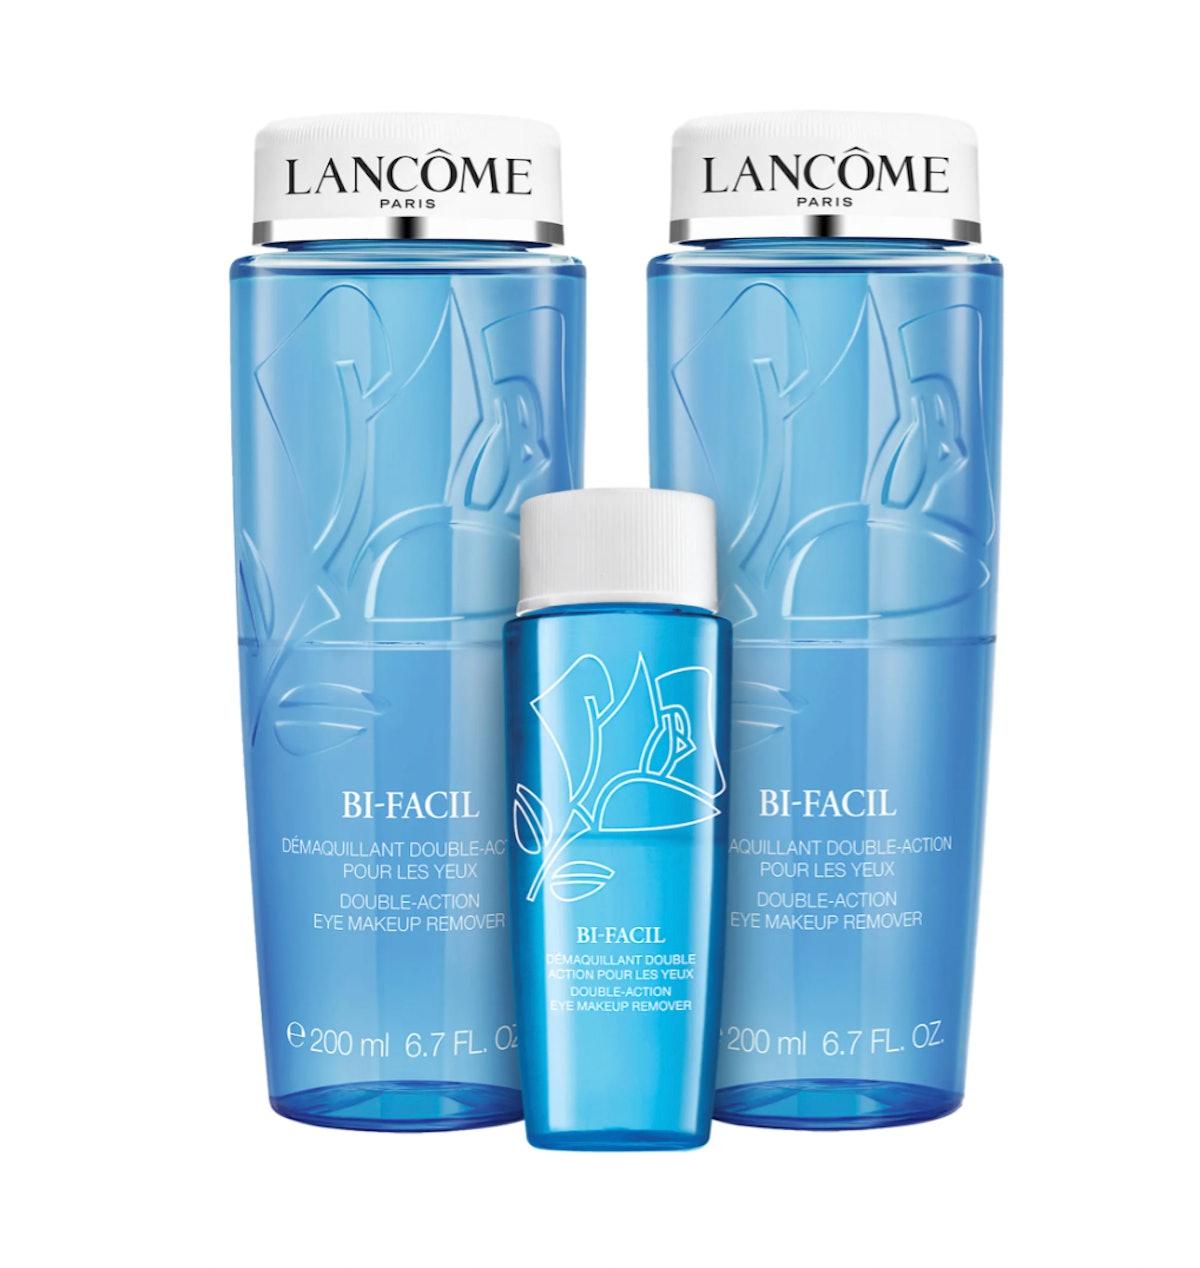 Lancome Bi-Facil Eye Makeup Remover Trio